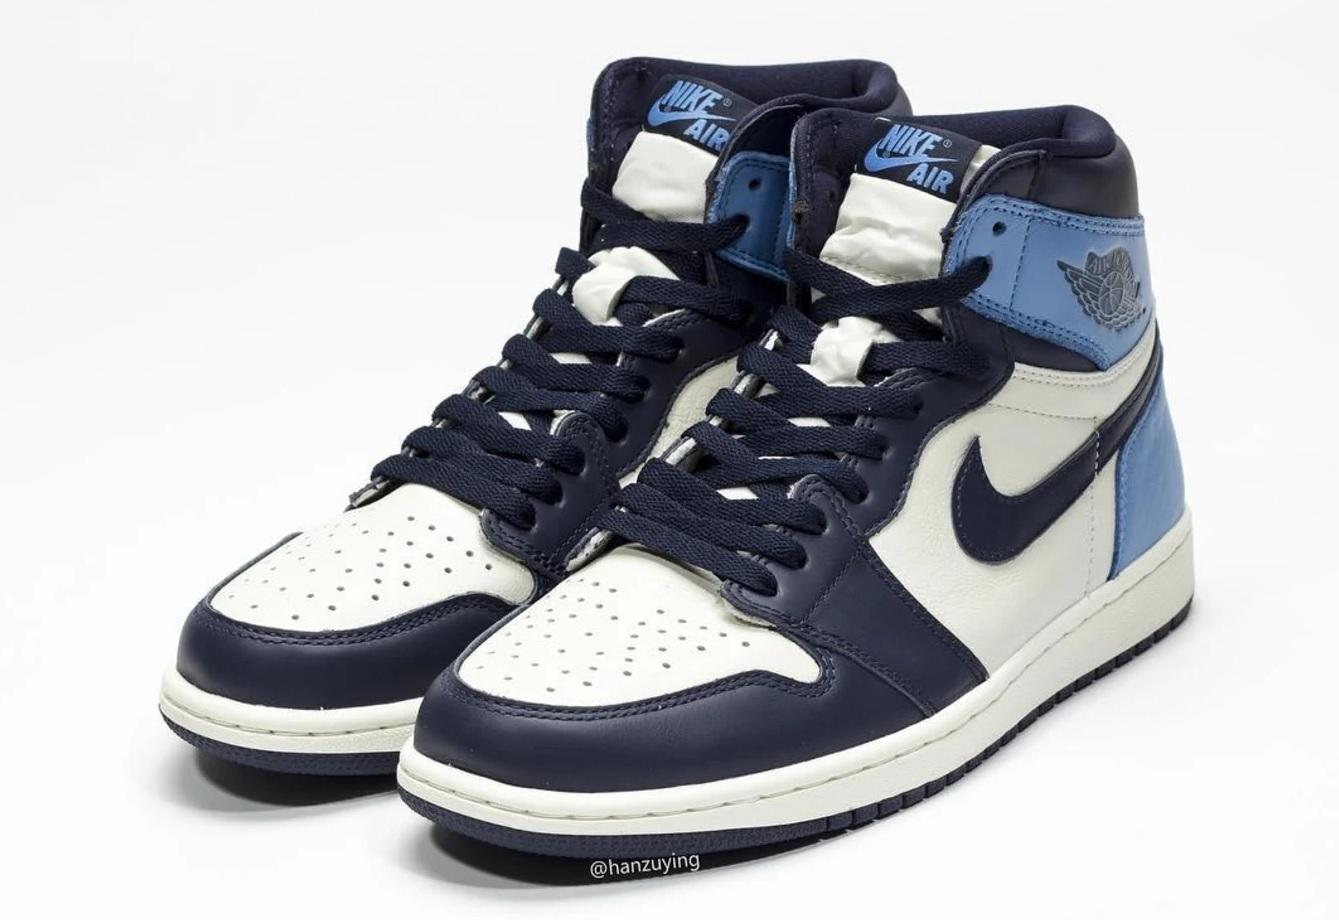 la meilleure attitude cf533 7d803 Buy: Nike Air Jordan 1 Retro High OG Obsidian University ...